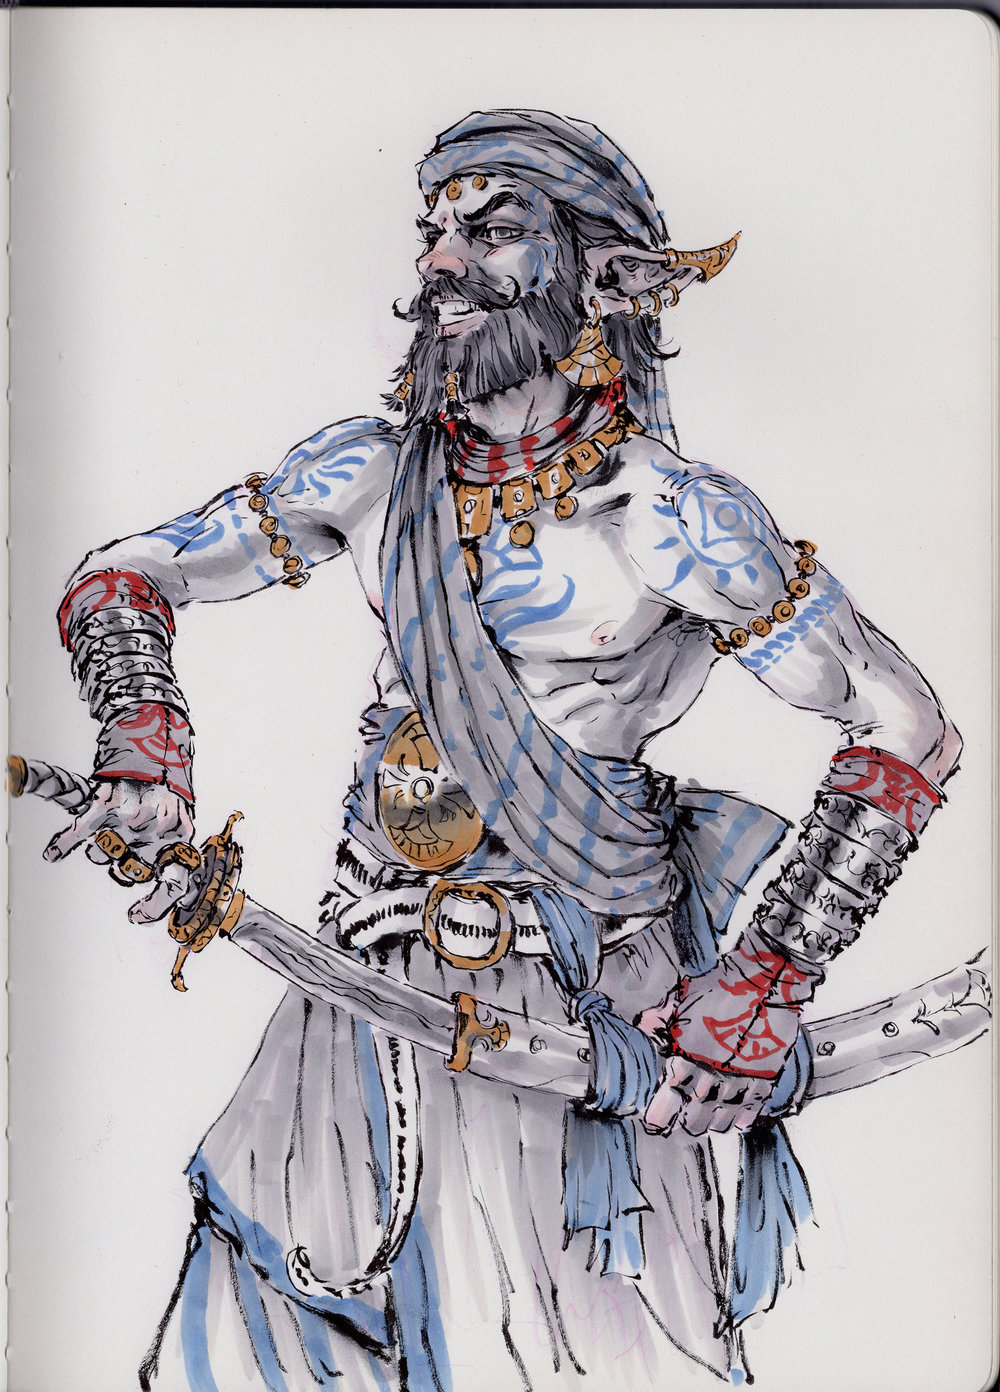 daniel-landerman-pirate-elf.jpg